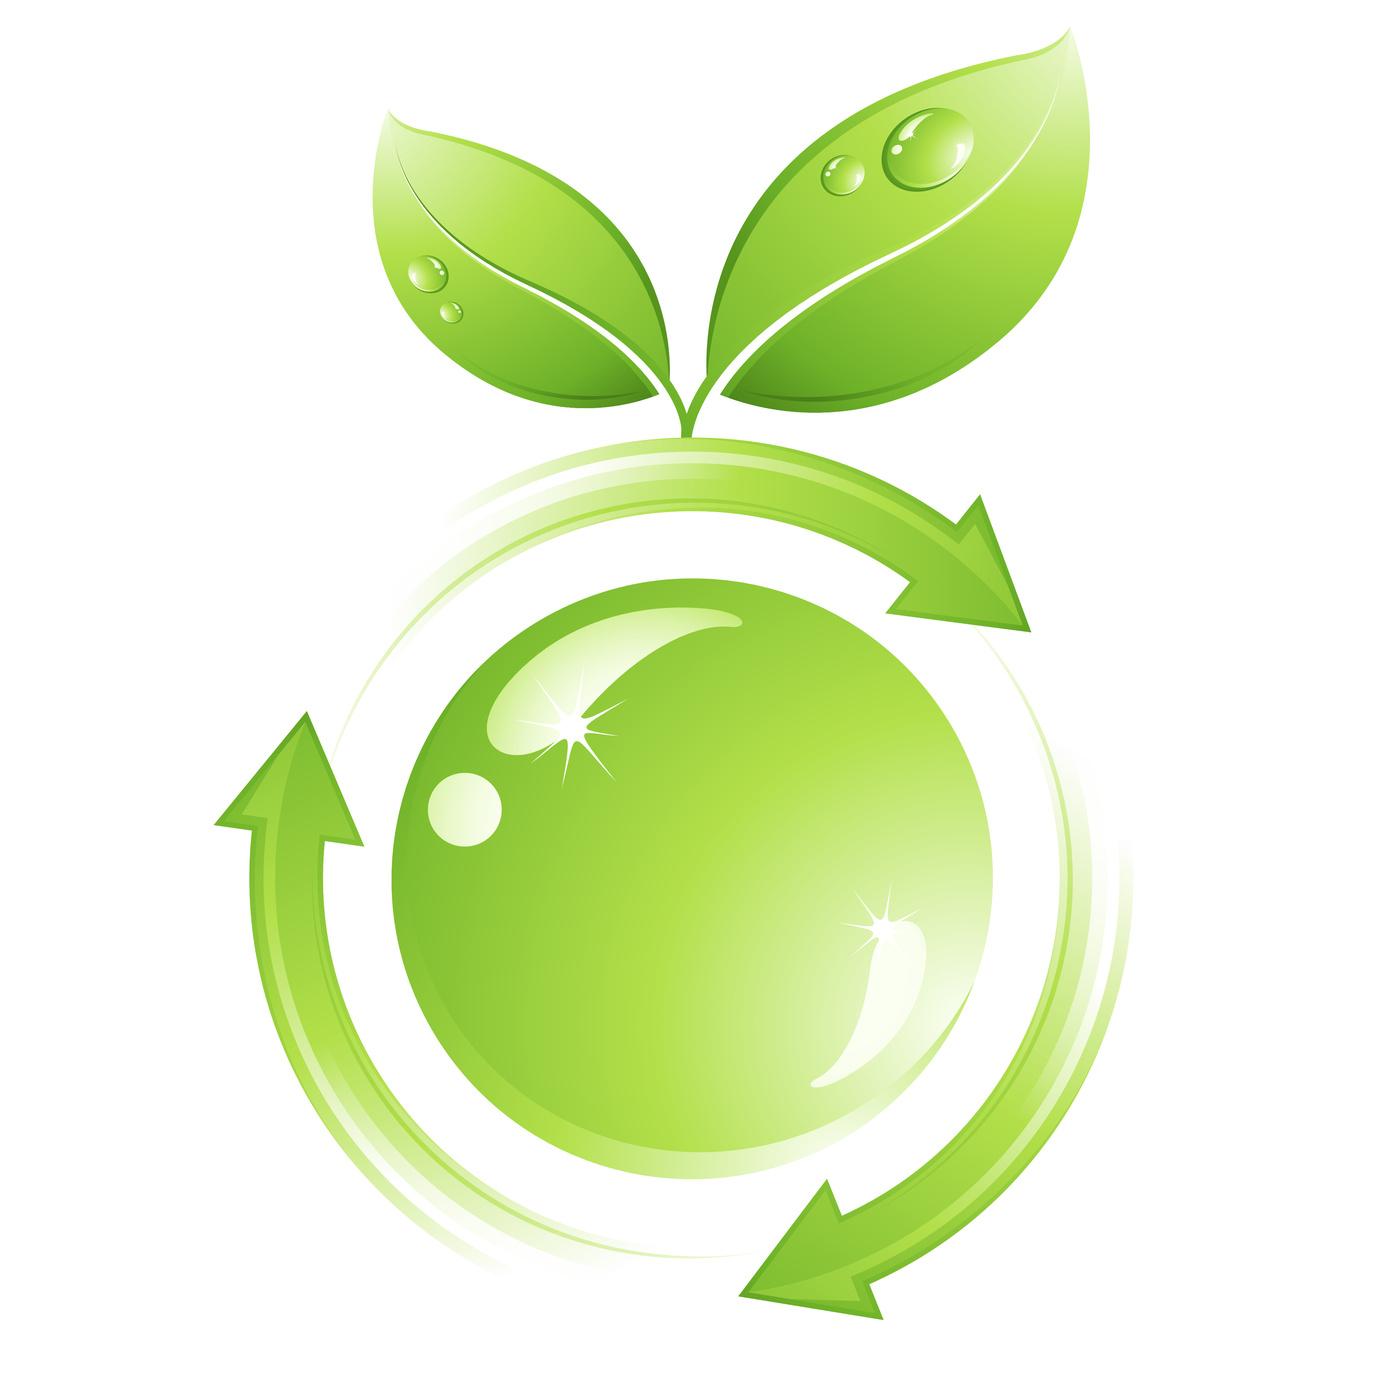 Free Environmental Logos Cliparts, Download Free Clip Art.